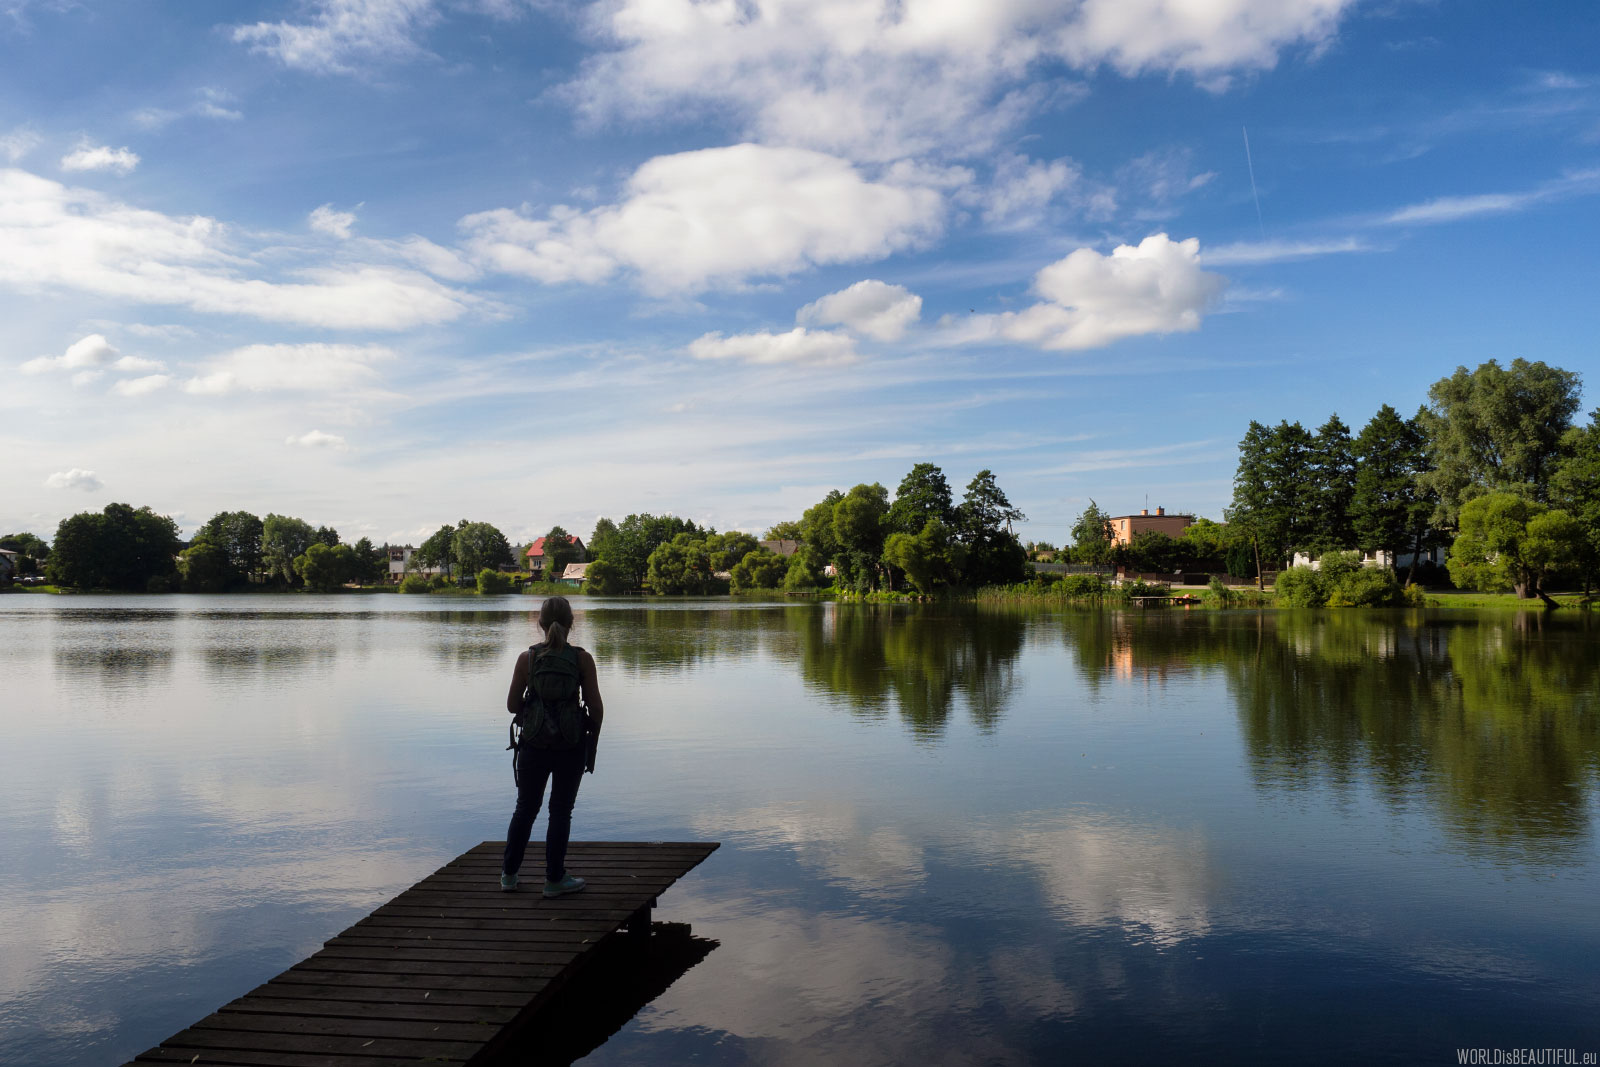 Buk (Beech) Lake